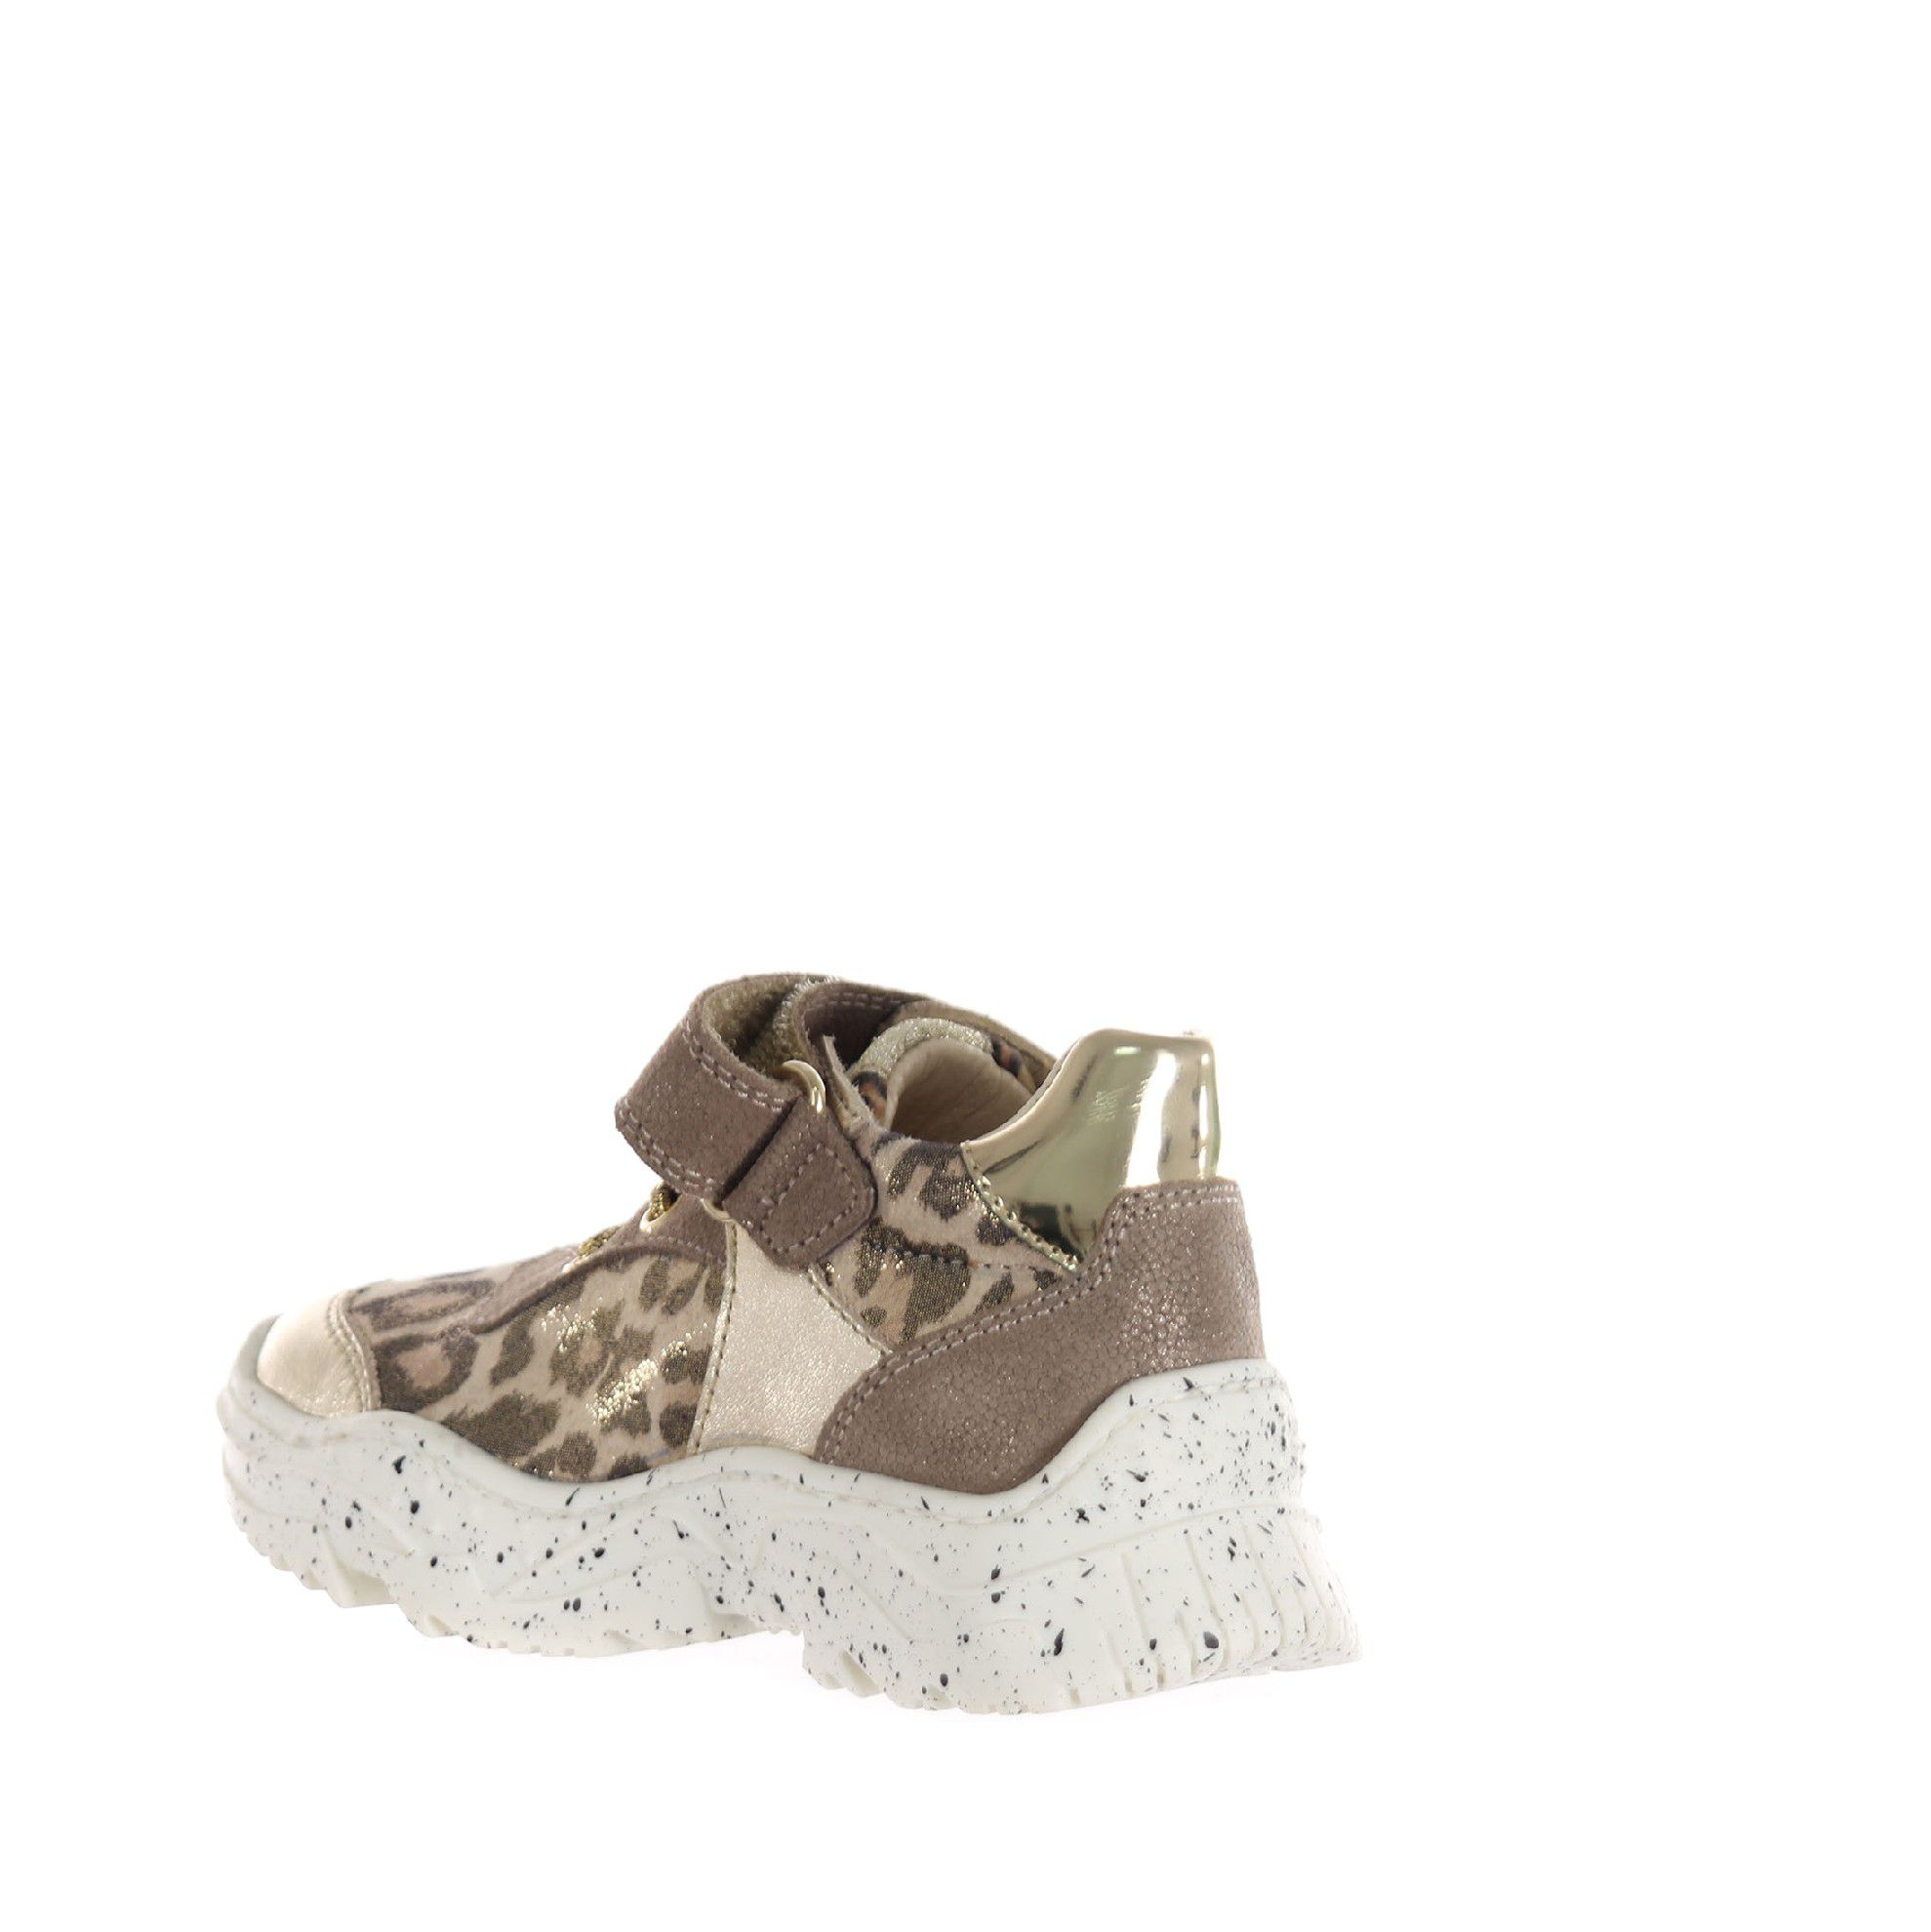 Naturino sneaker in pelle metal da bambina